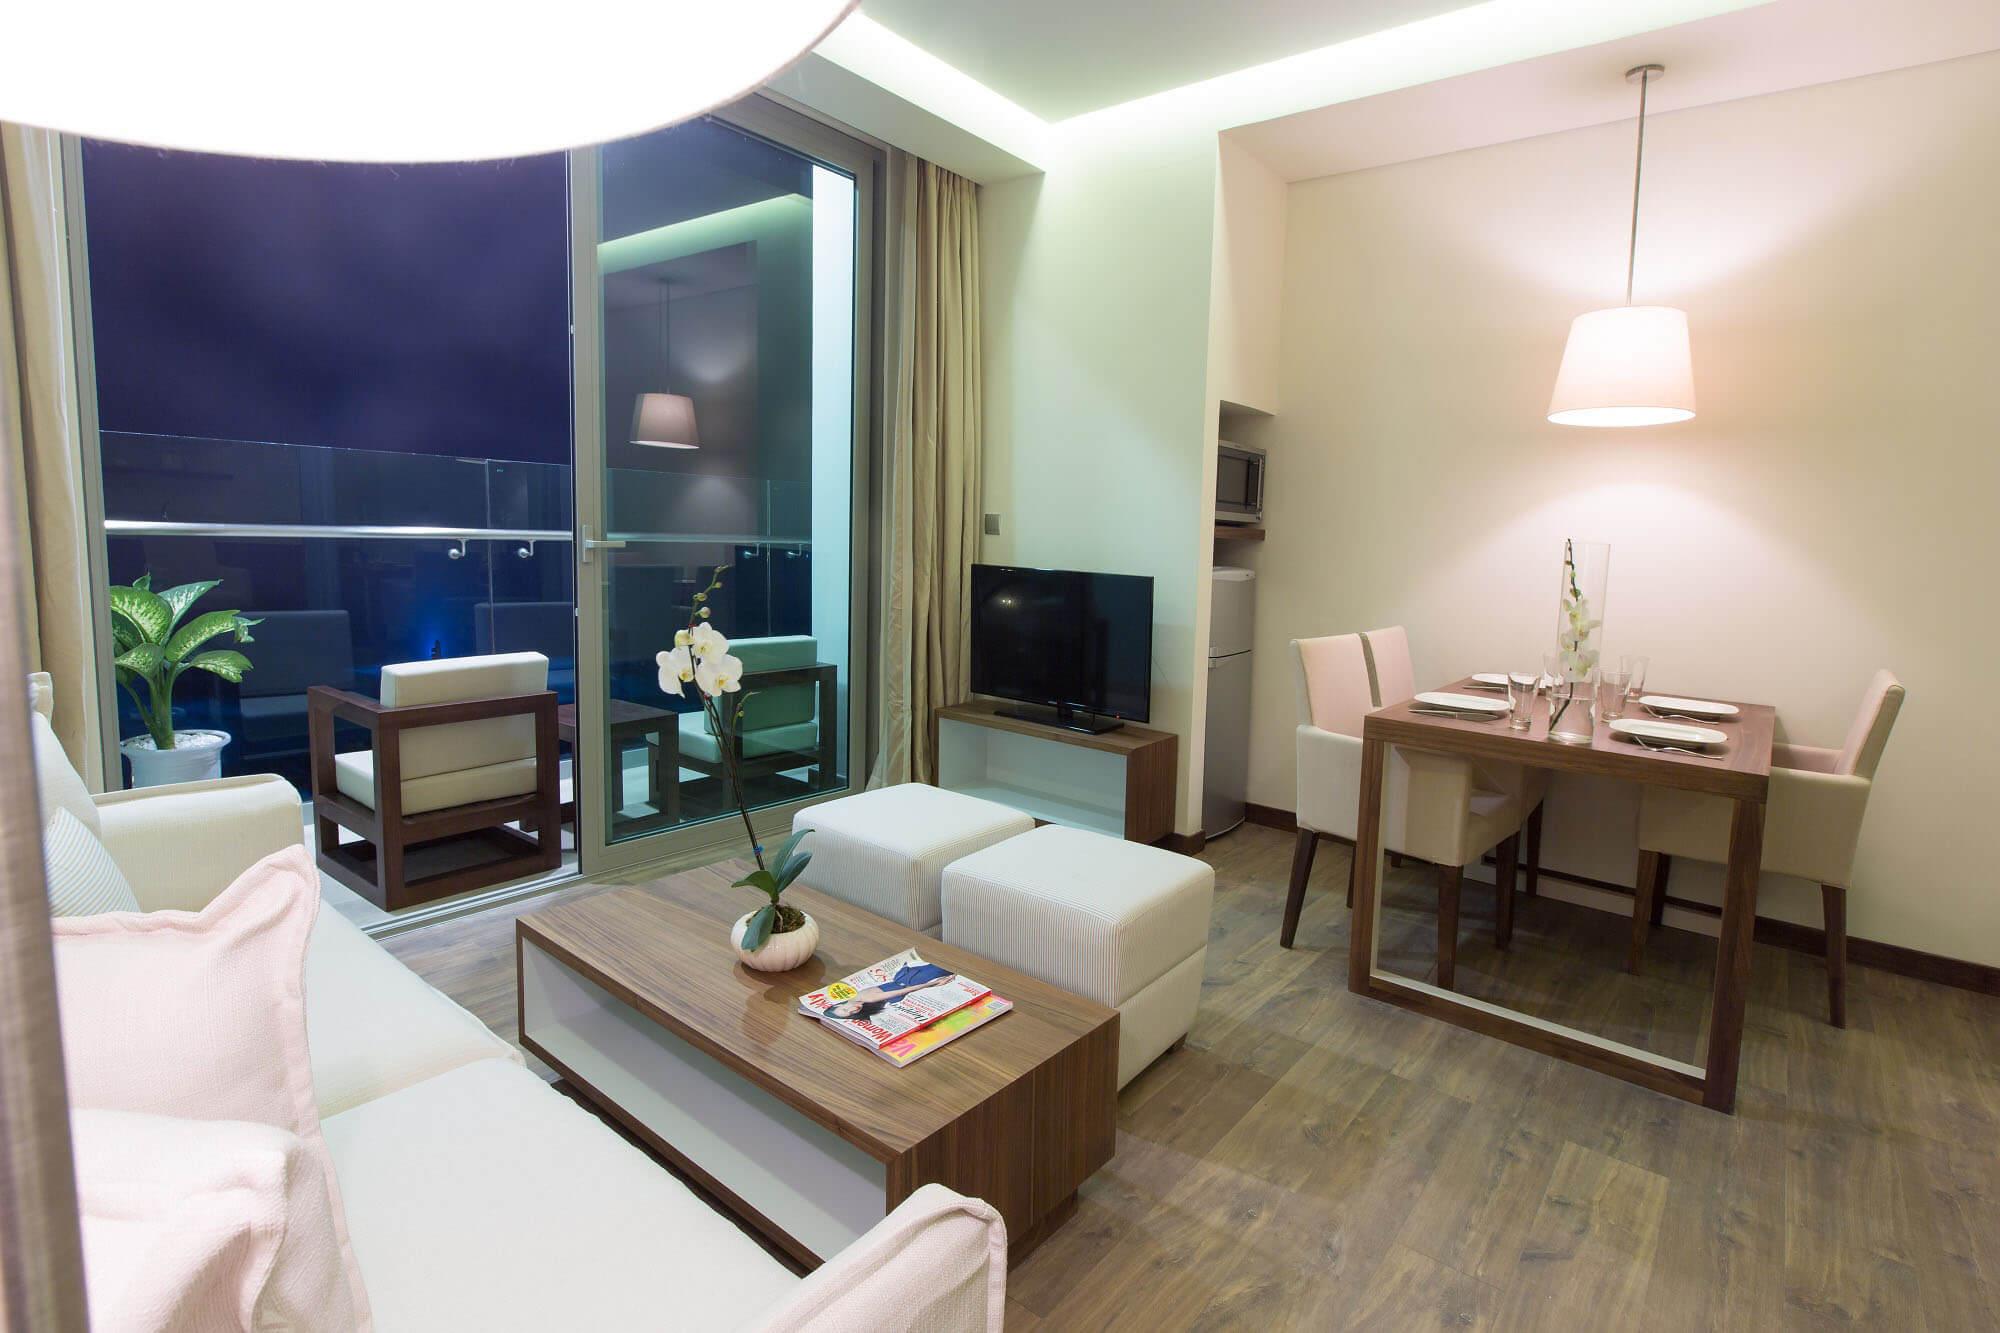 Highlight Plus Apartment Apartment A La Carte Danang Beach Hotel 200 Vo Nguyen Giap Danang Fantasticity Com 04